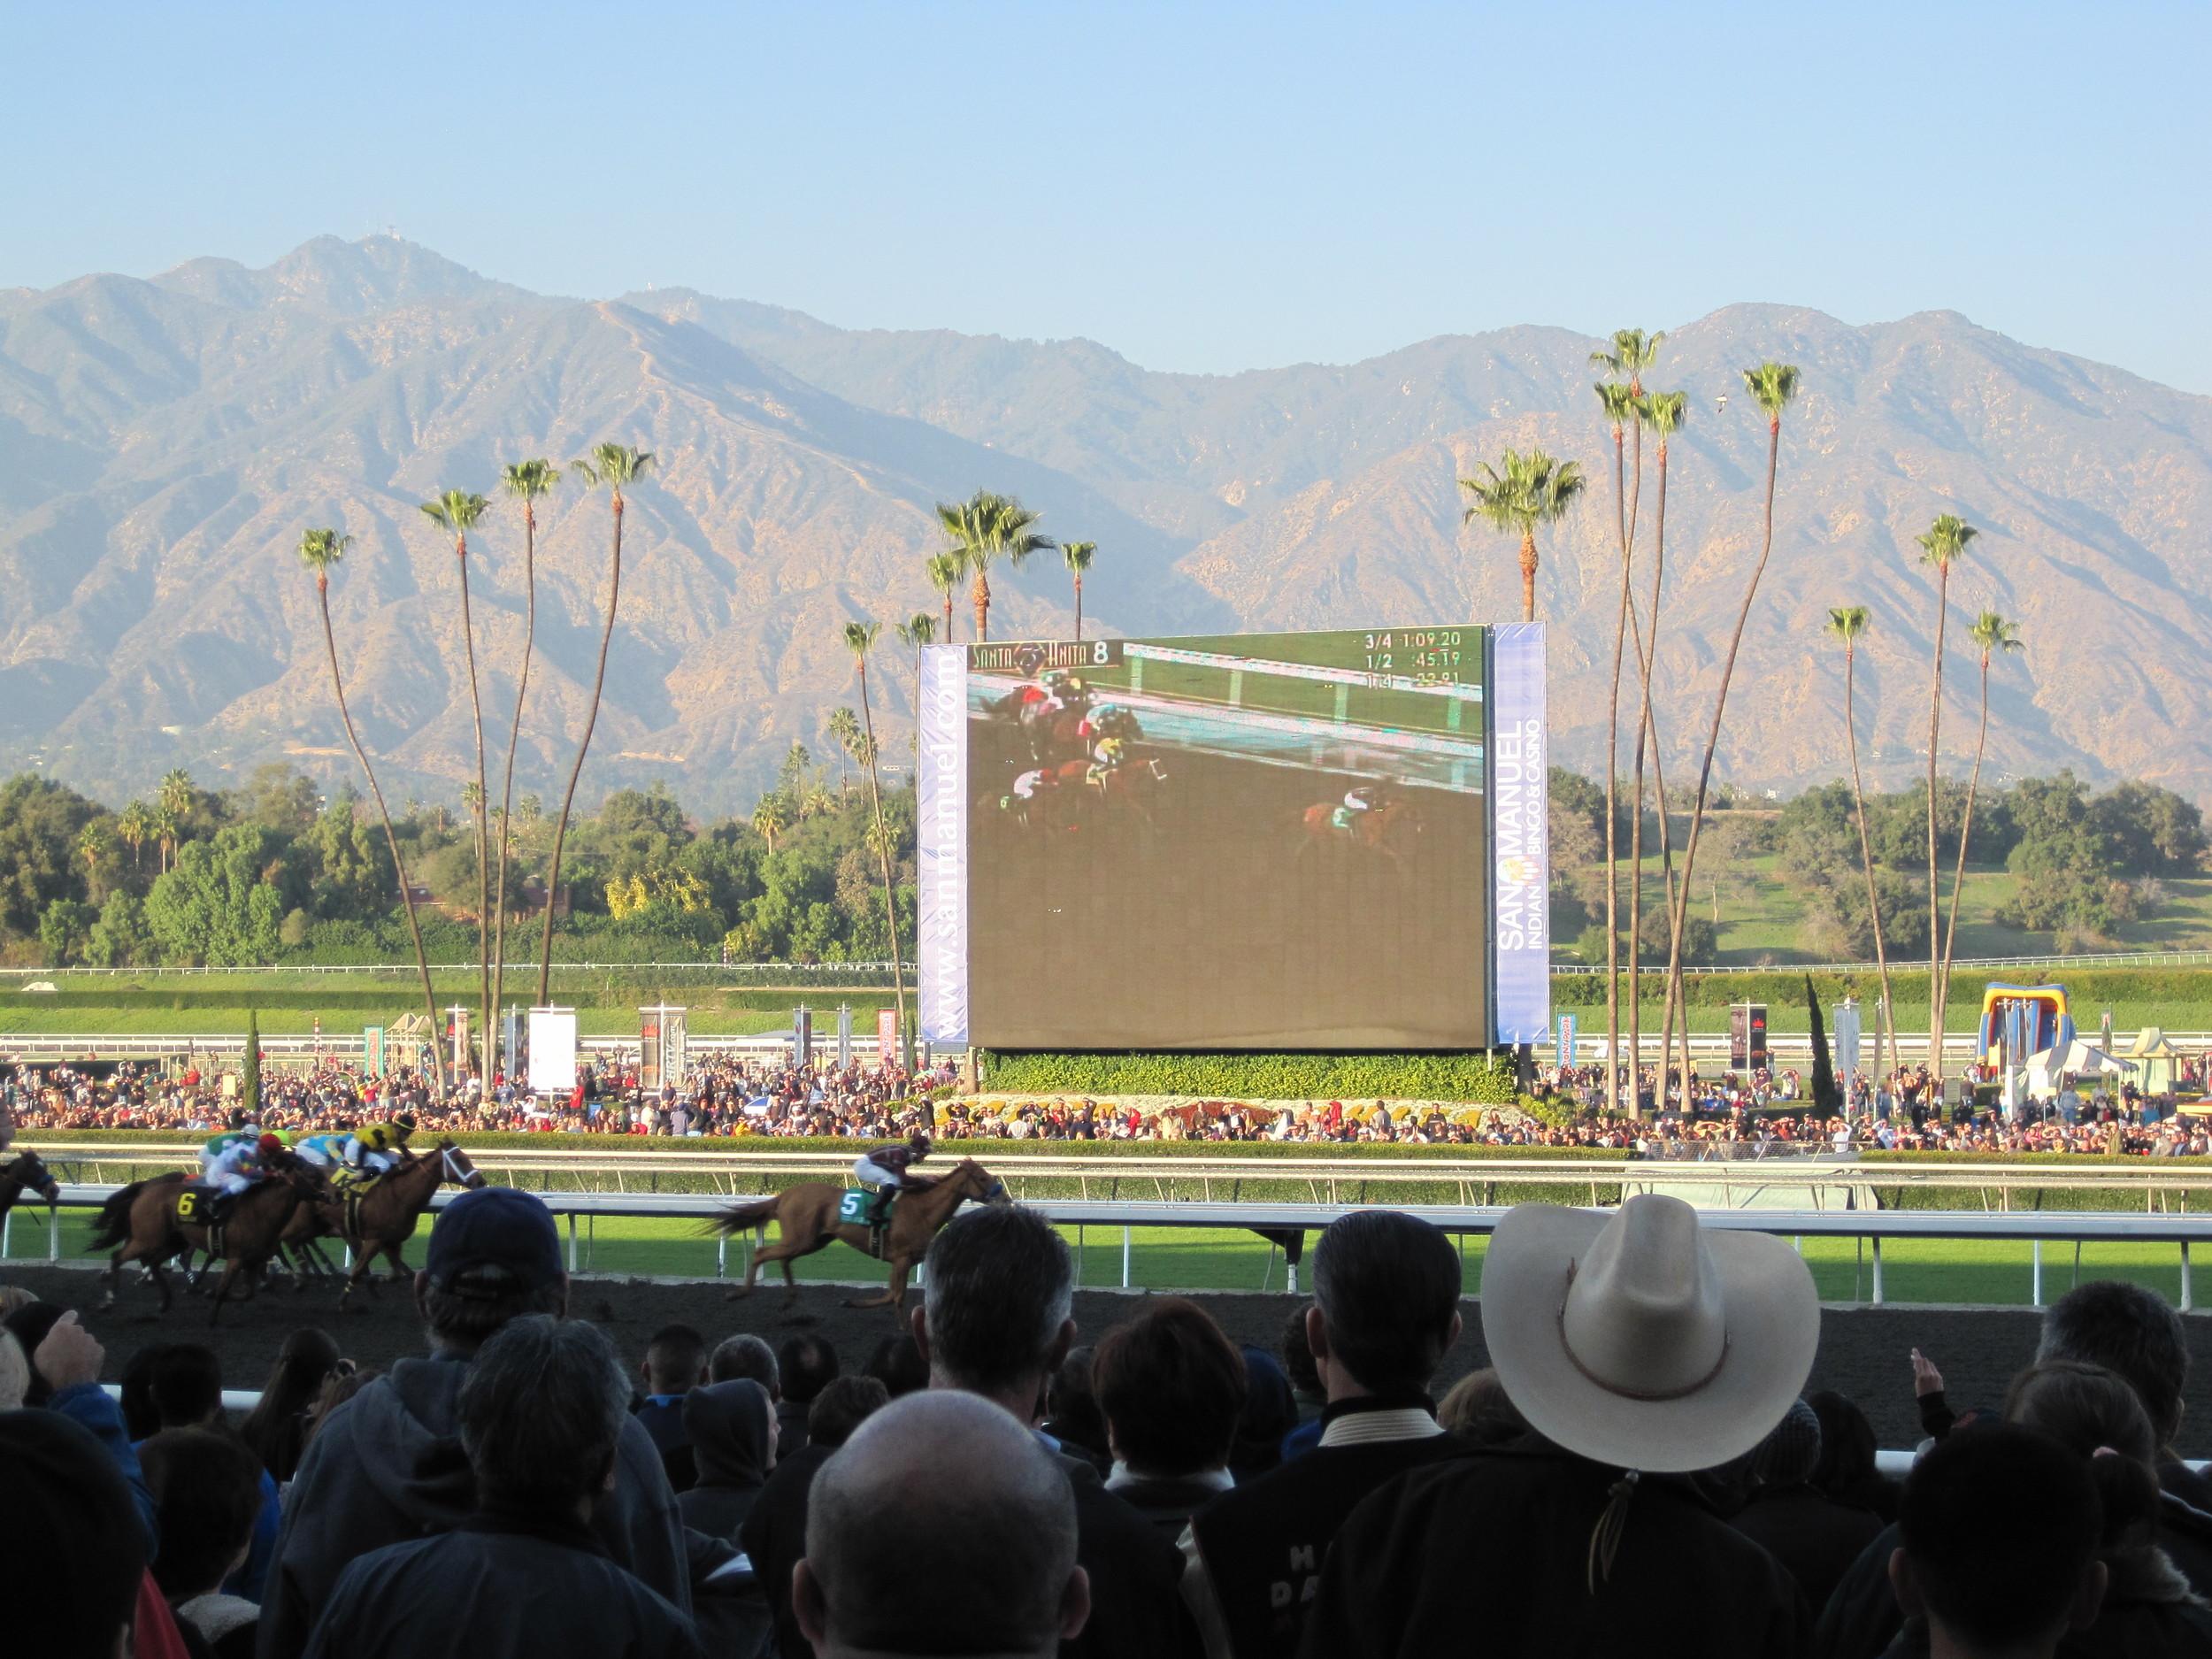 Santa Anita Racecourse, Los Angeles, California USA